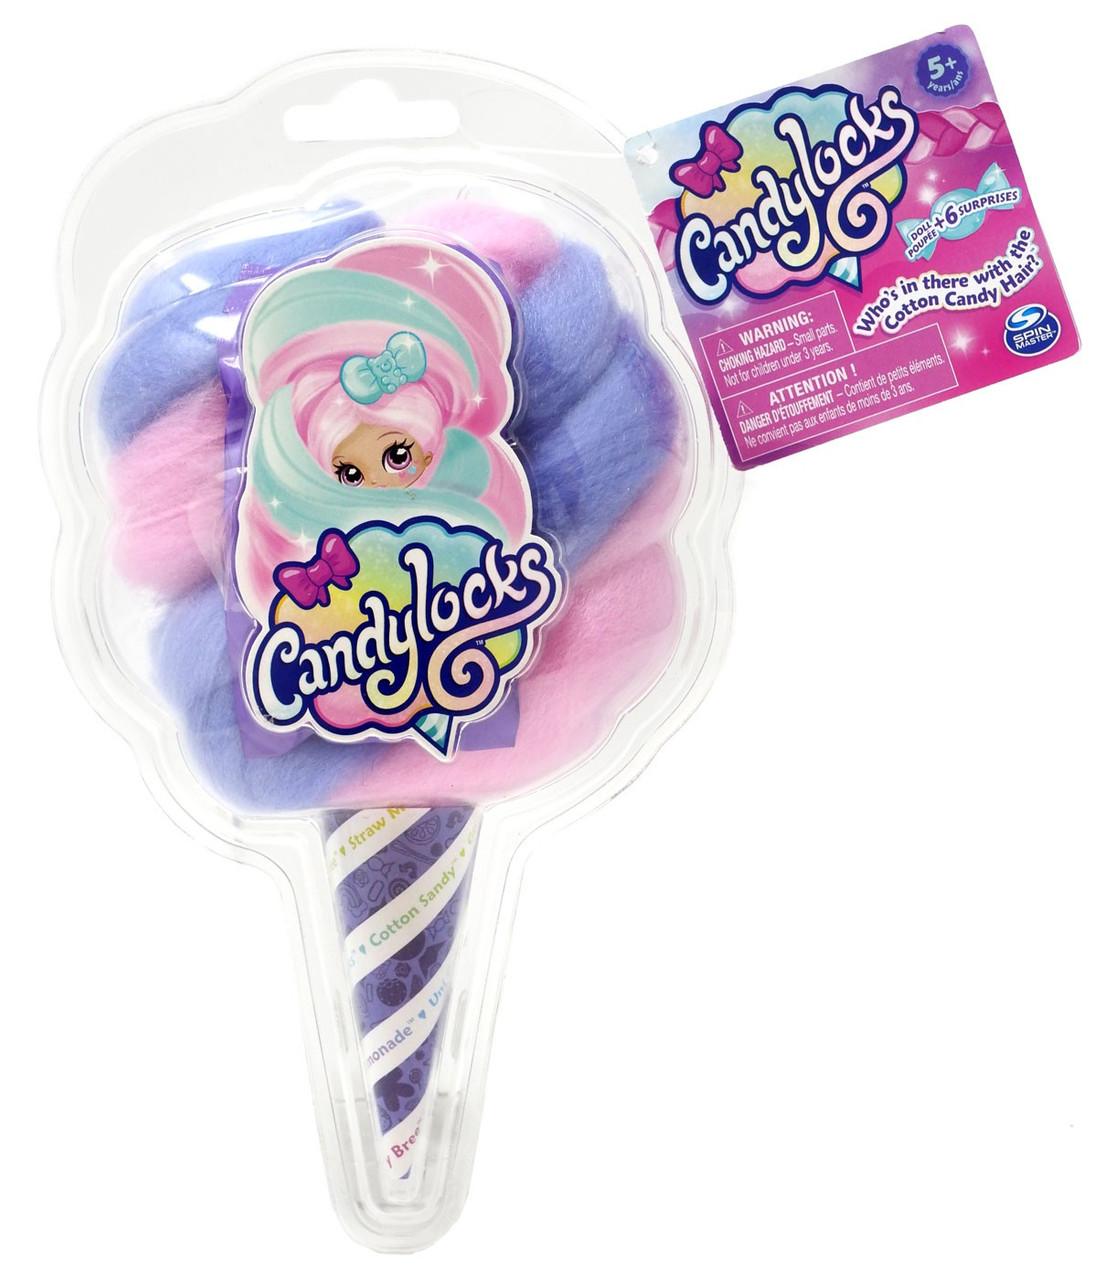 Candylocks Doll Spin Master Cute Kawaii Christmas Gift Free Ship Pink And Blue